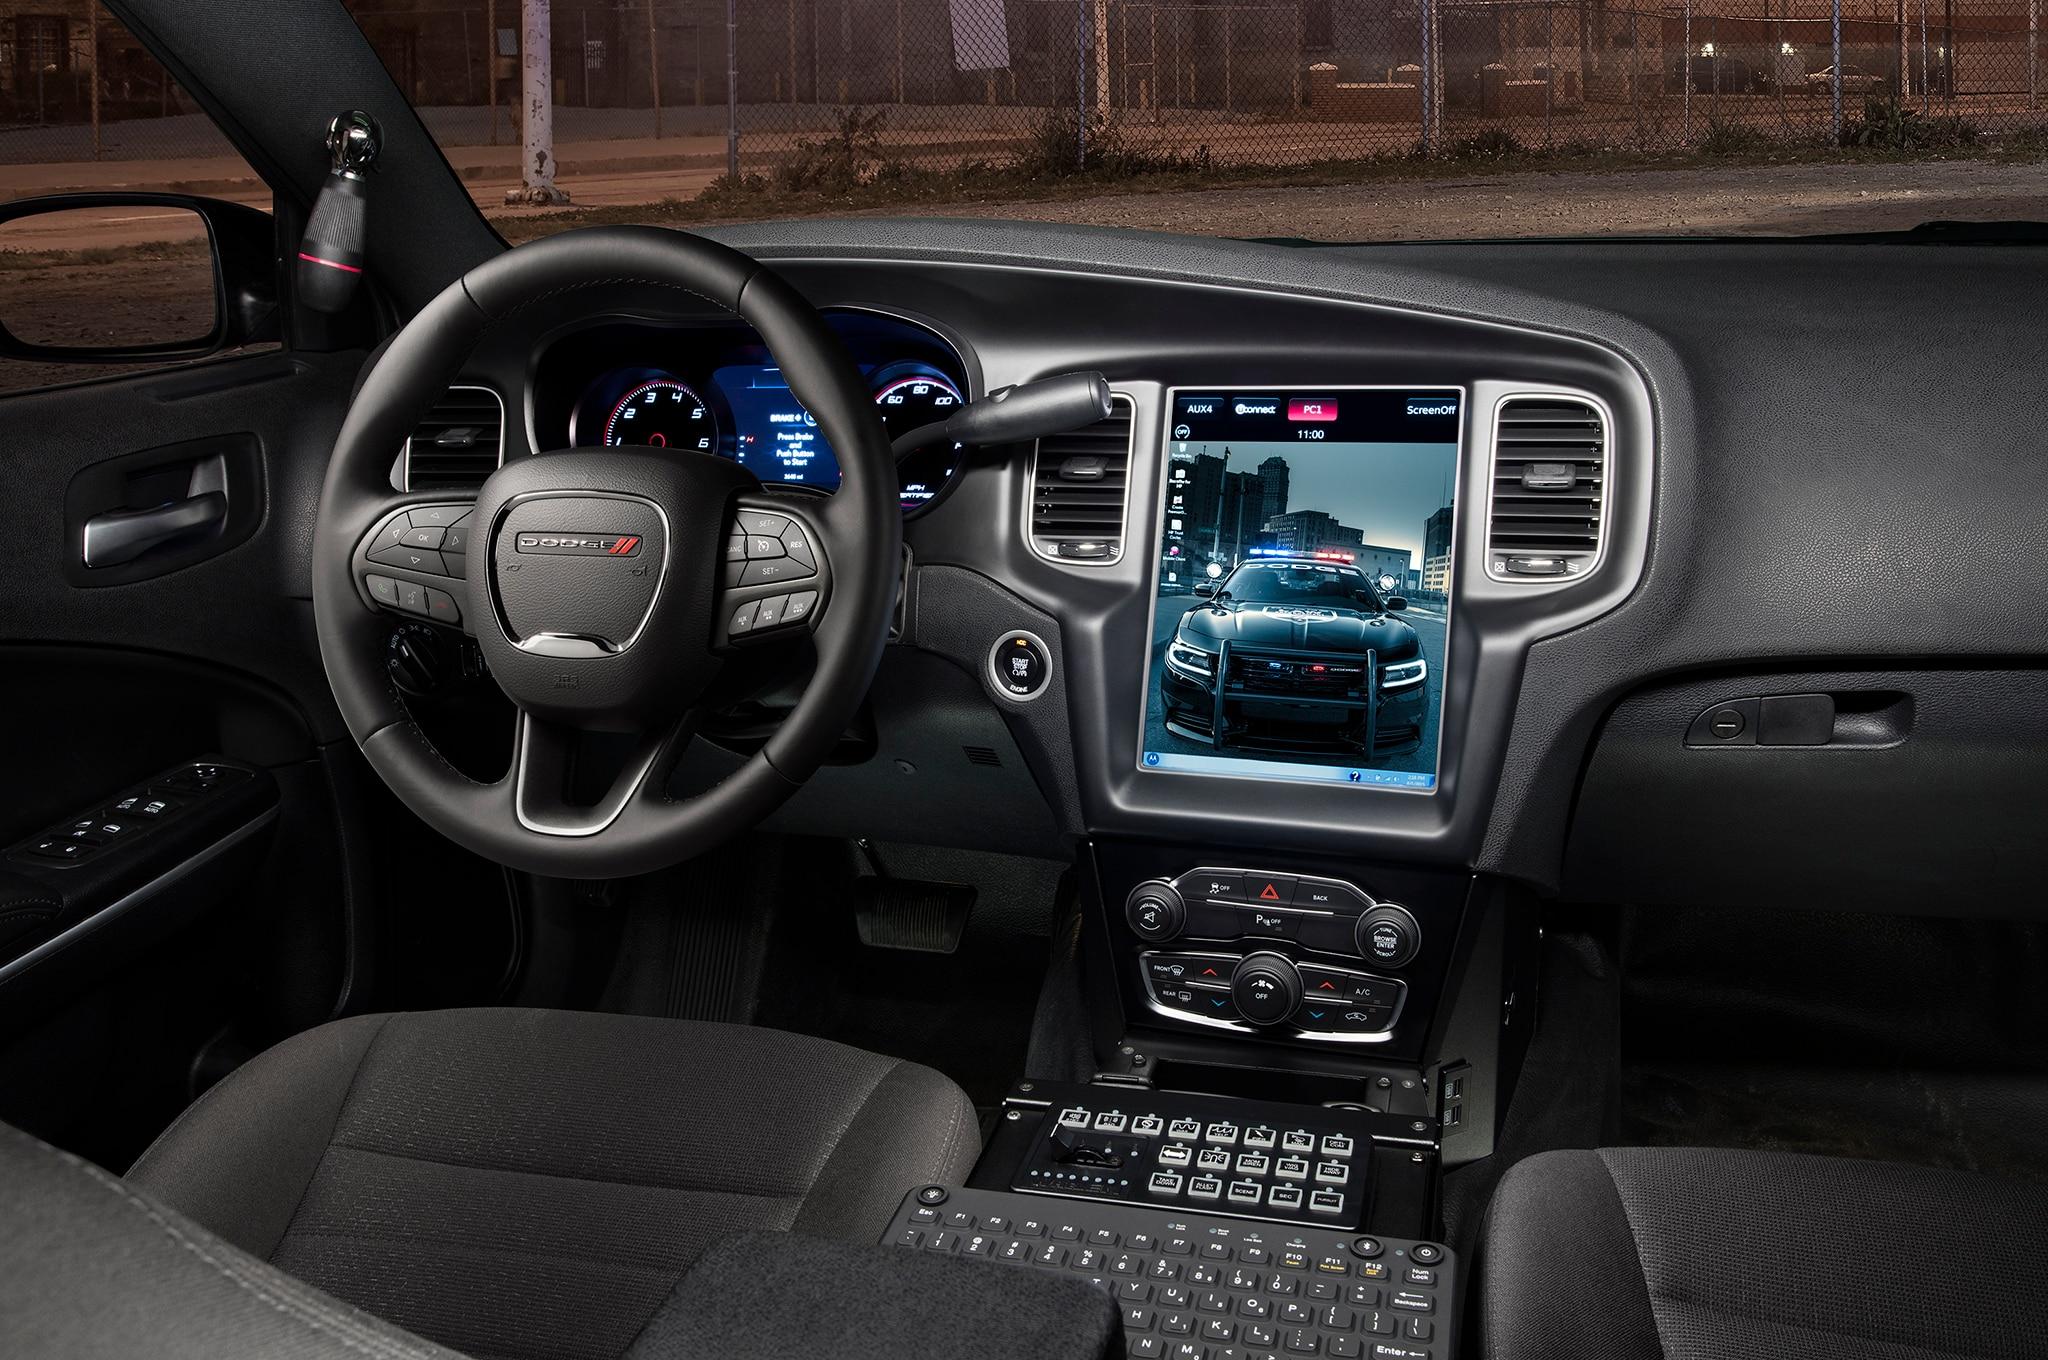 2016 Dodge Charger Pursuit Touchscreen 11